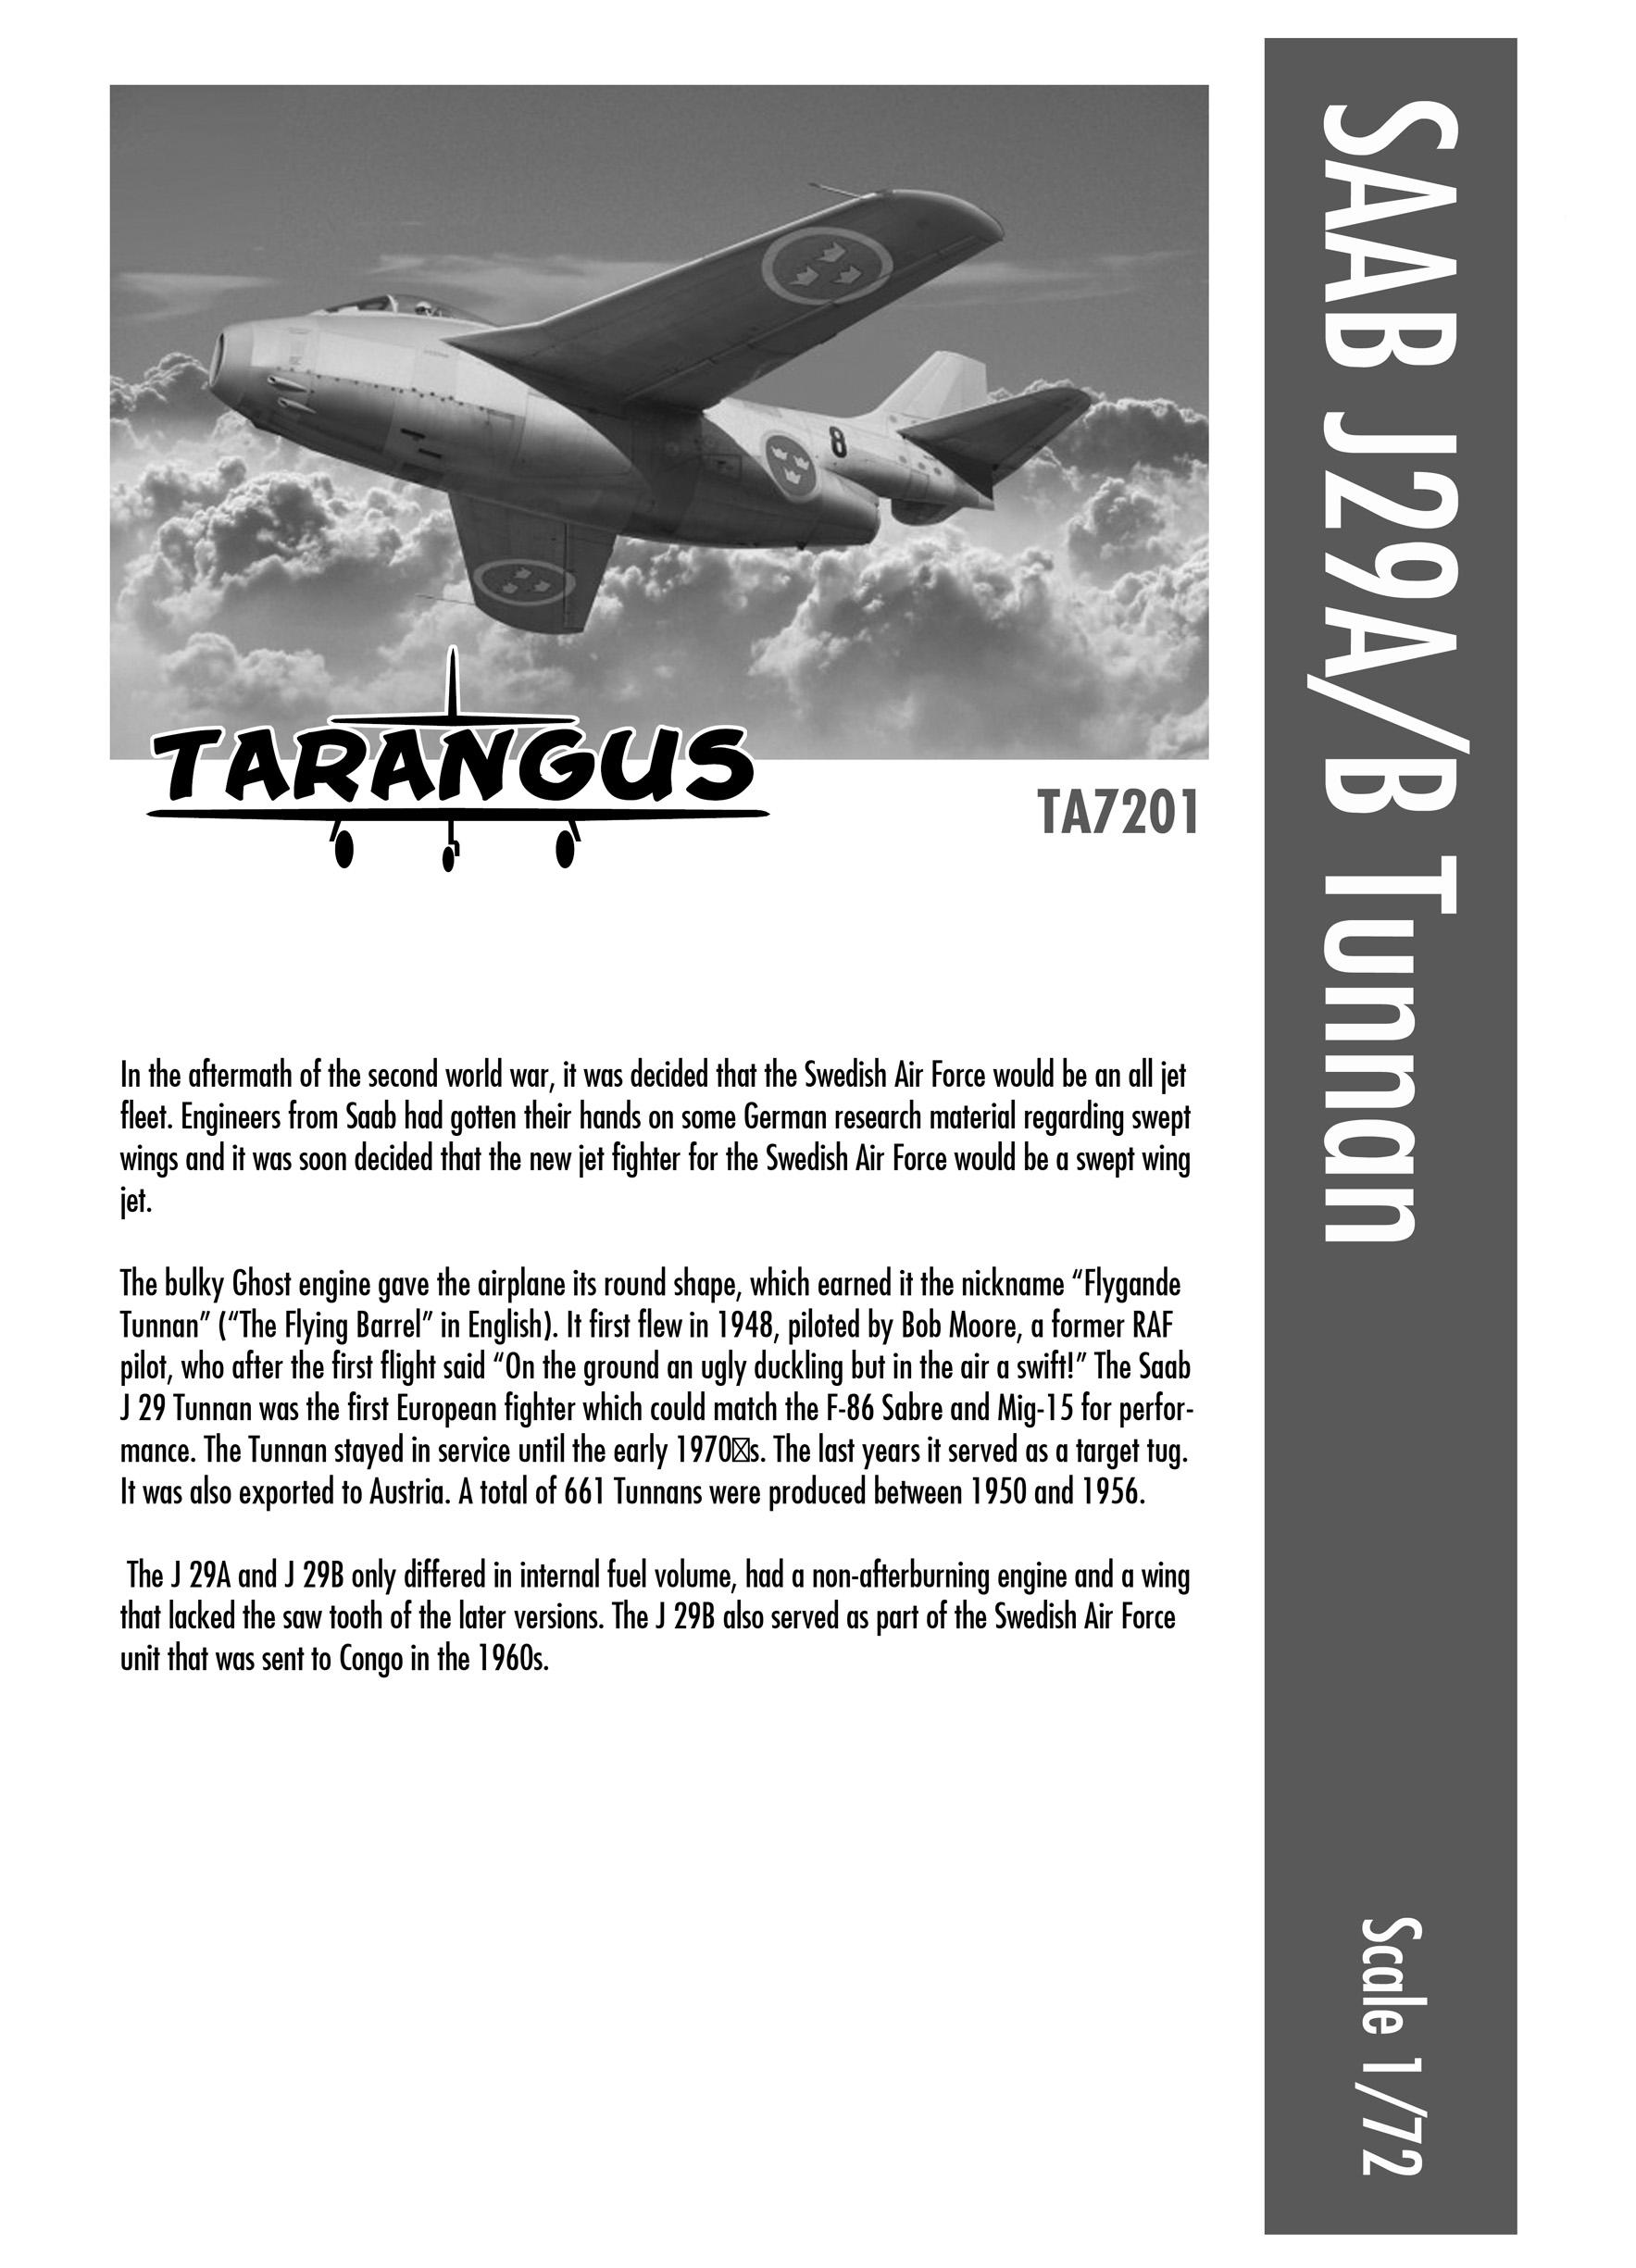 TA7201_page1